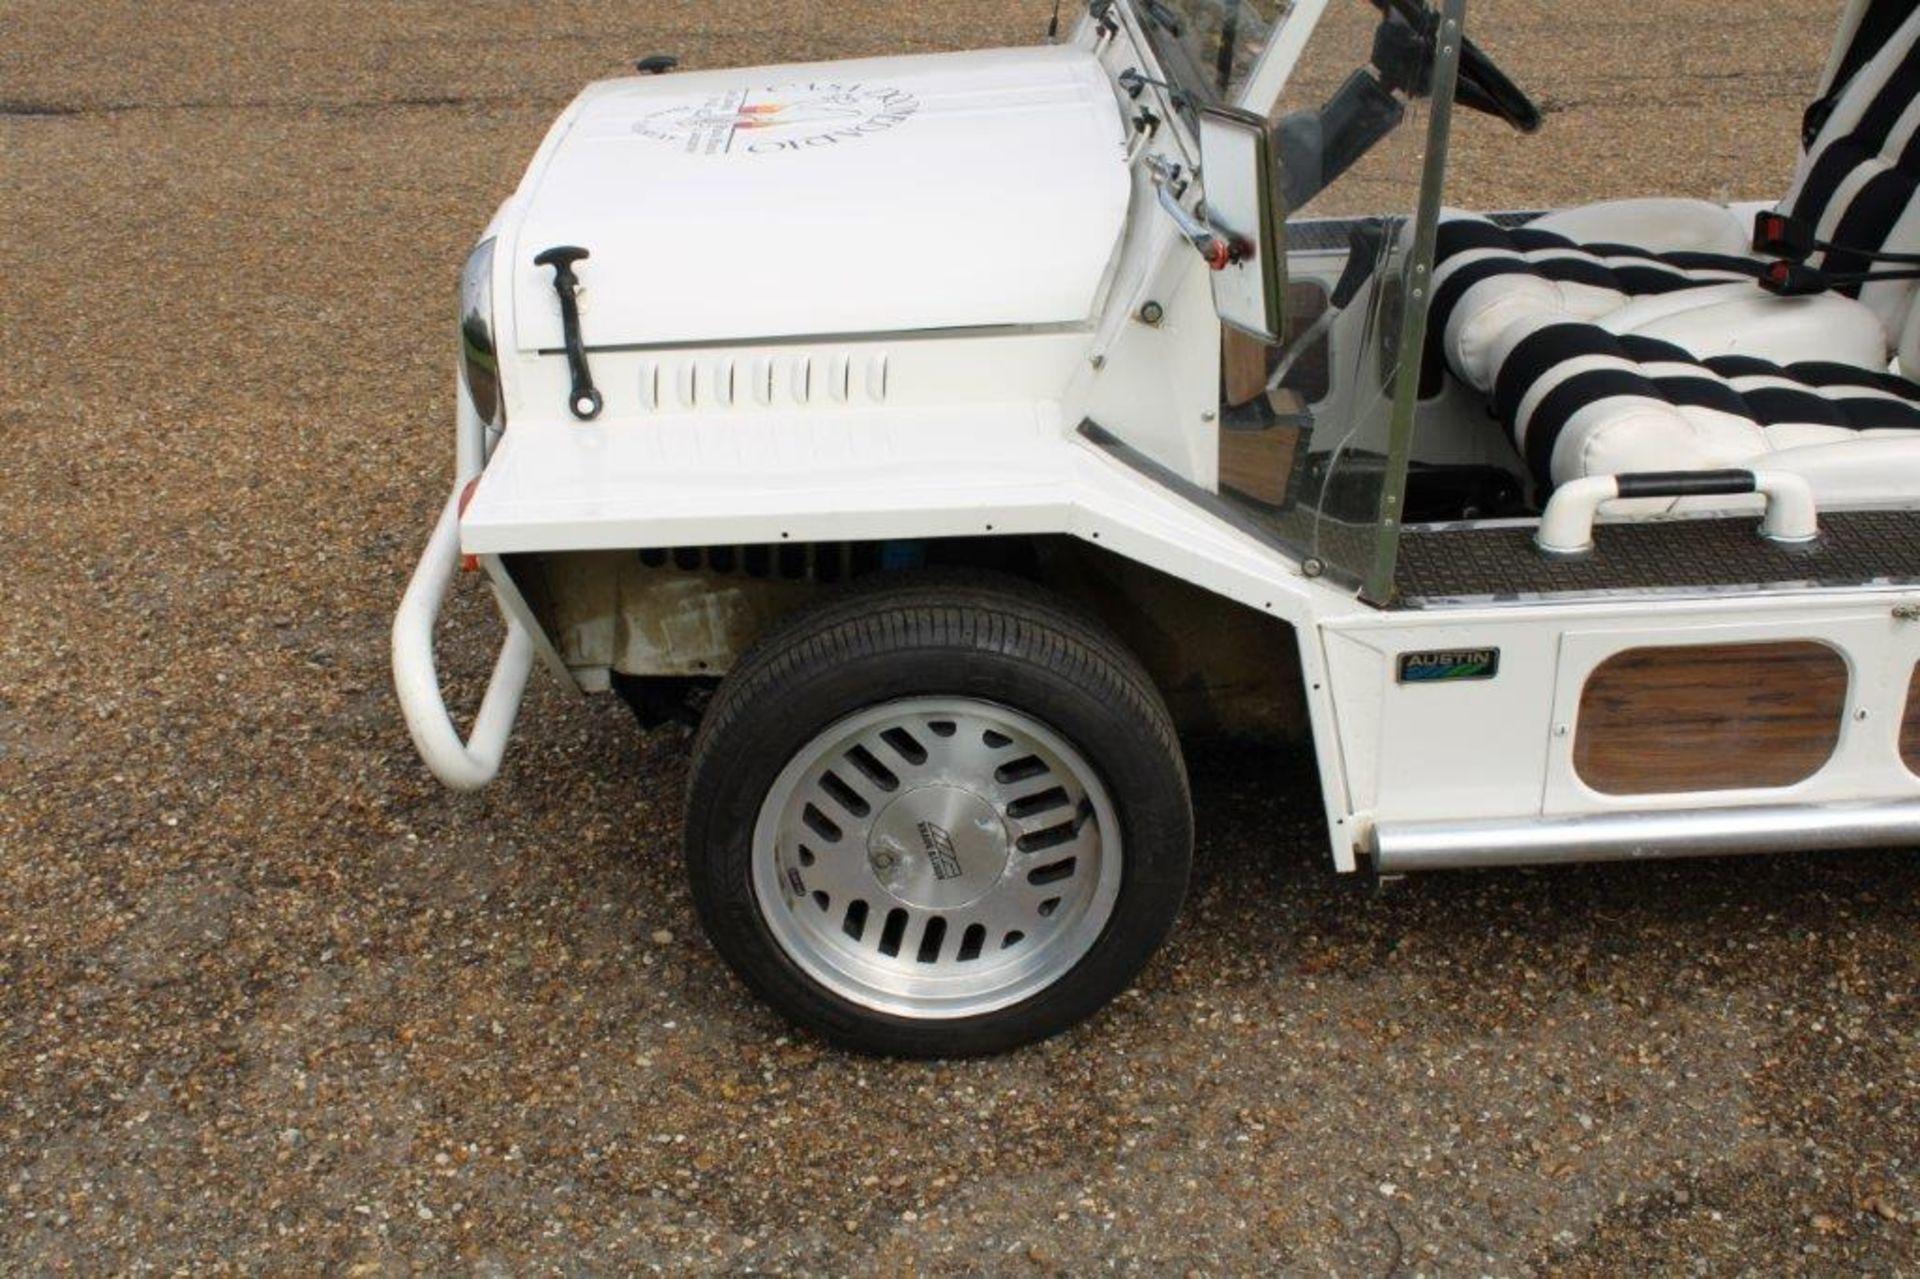 1988 Austin Rover Mini Moke - Image 10 of 22